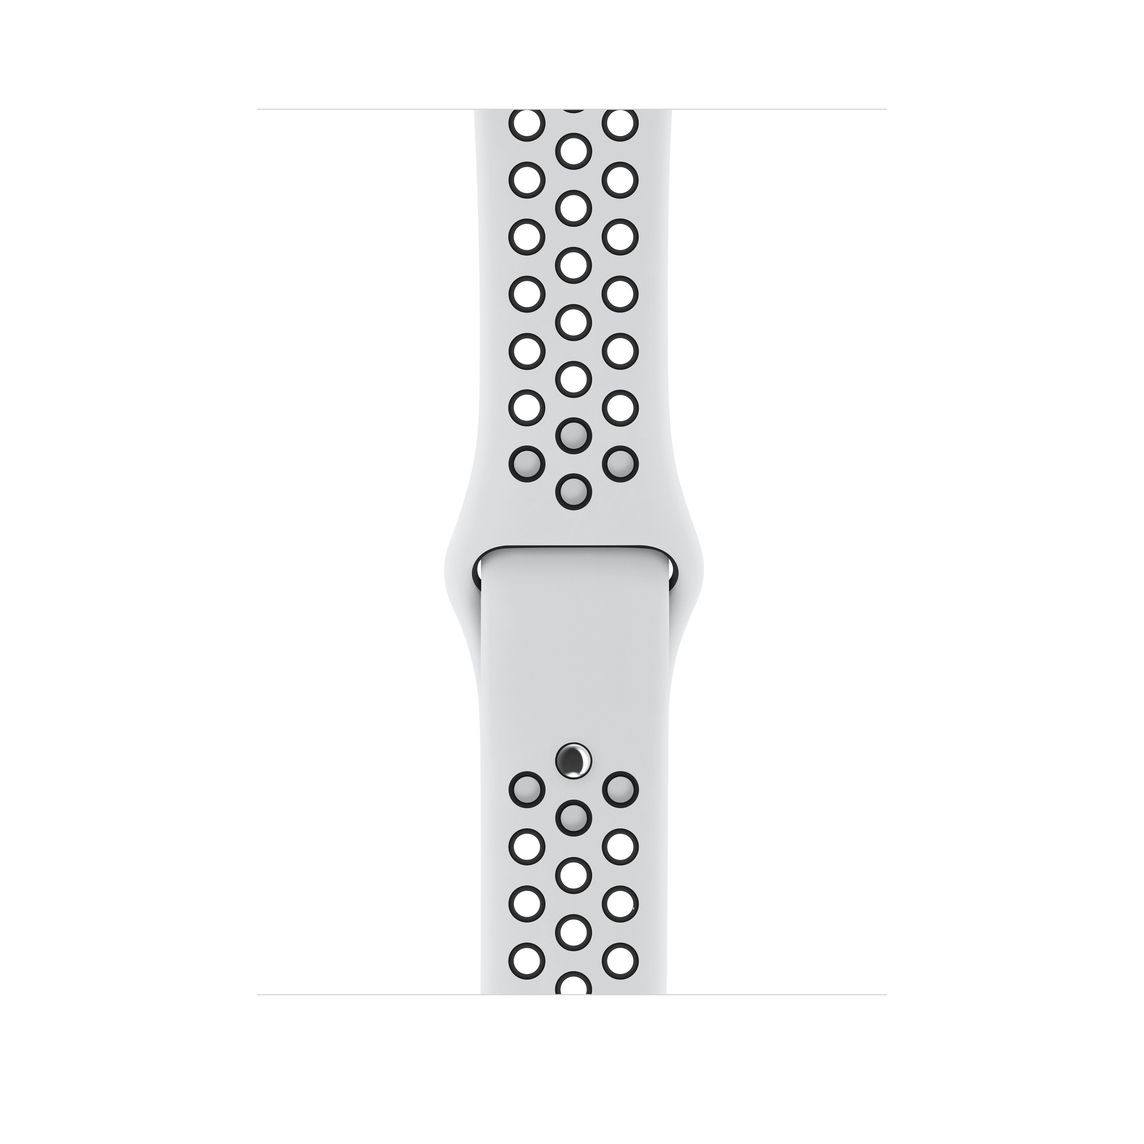 código Morse sátira Gasto  Refurbished Apple Watch Series 3 GPS, 42mm Silver Aluminum Case with Pure  Platinum/Black Nike Sport Band - Education - Apple